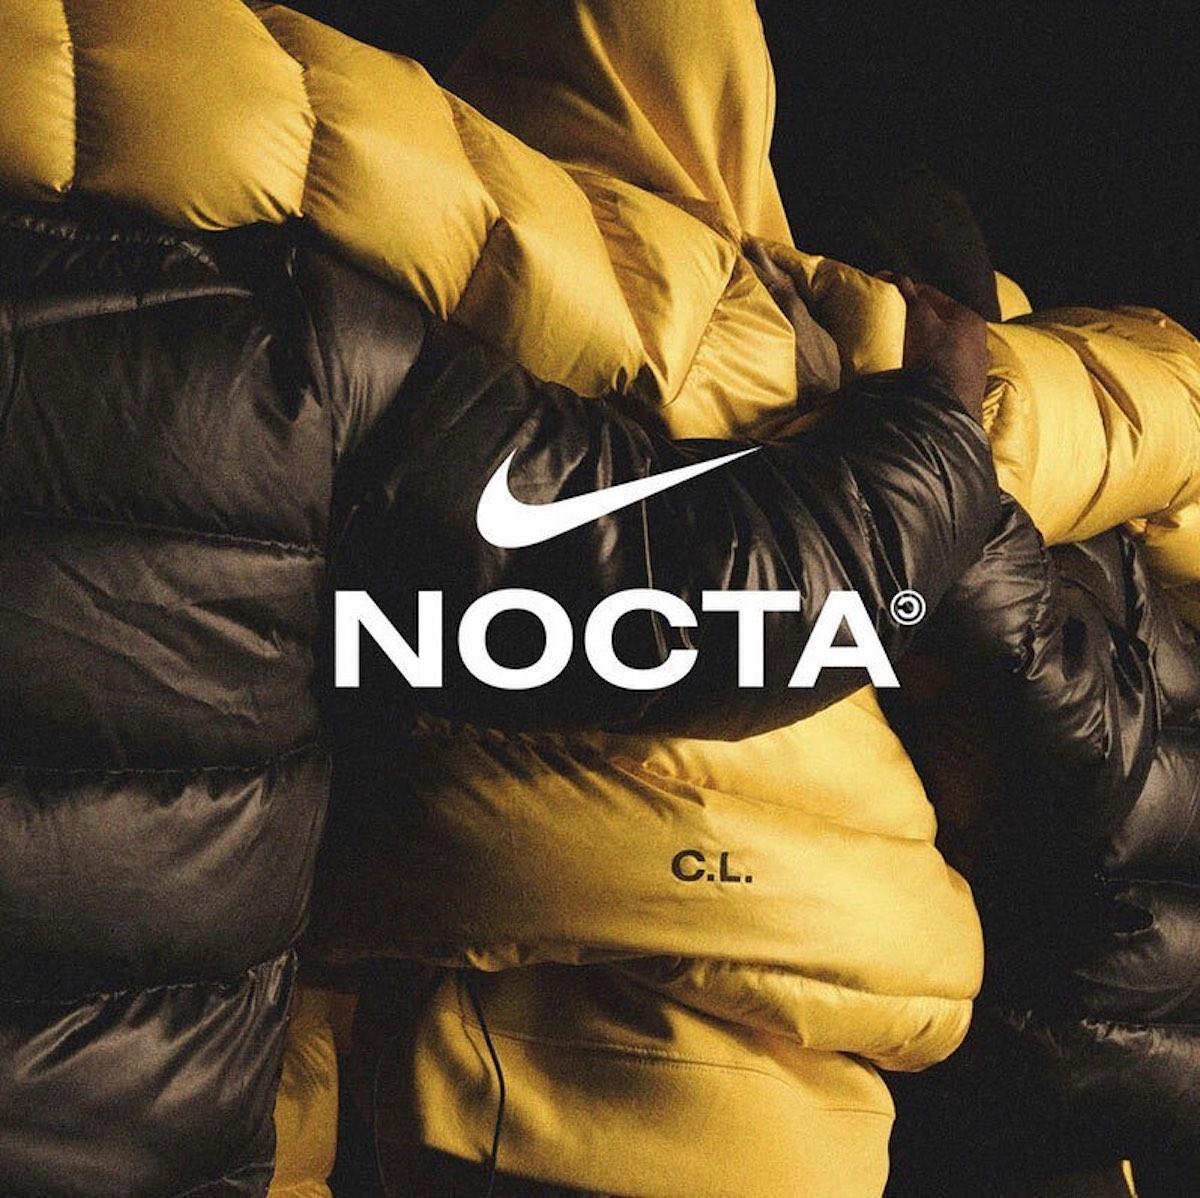 Drake & Nike Unveil New Collaborative 'NOCTA' Sub-Label